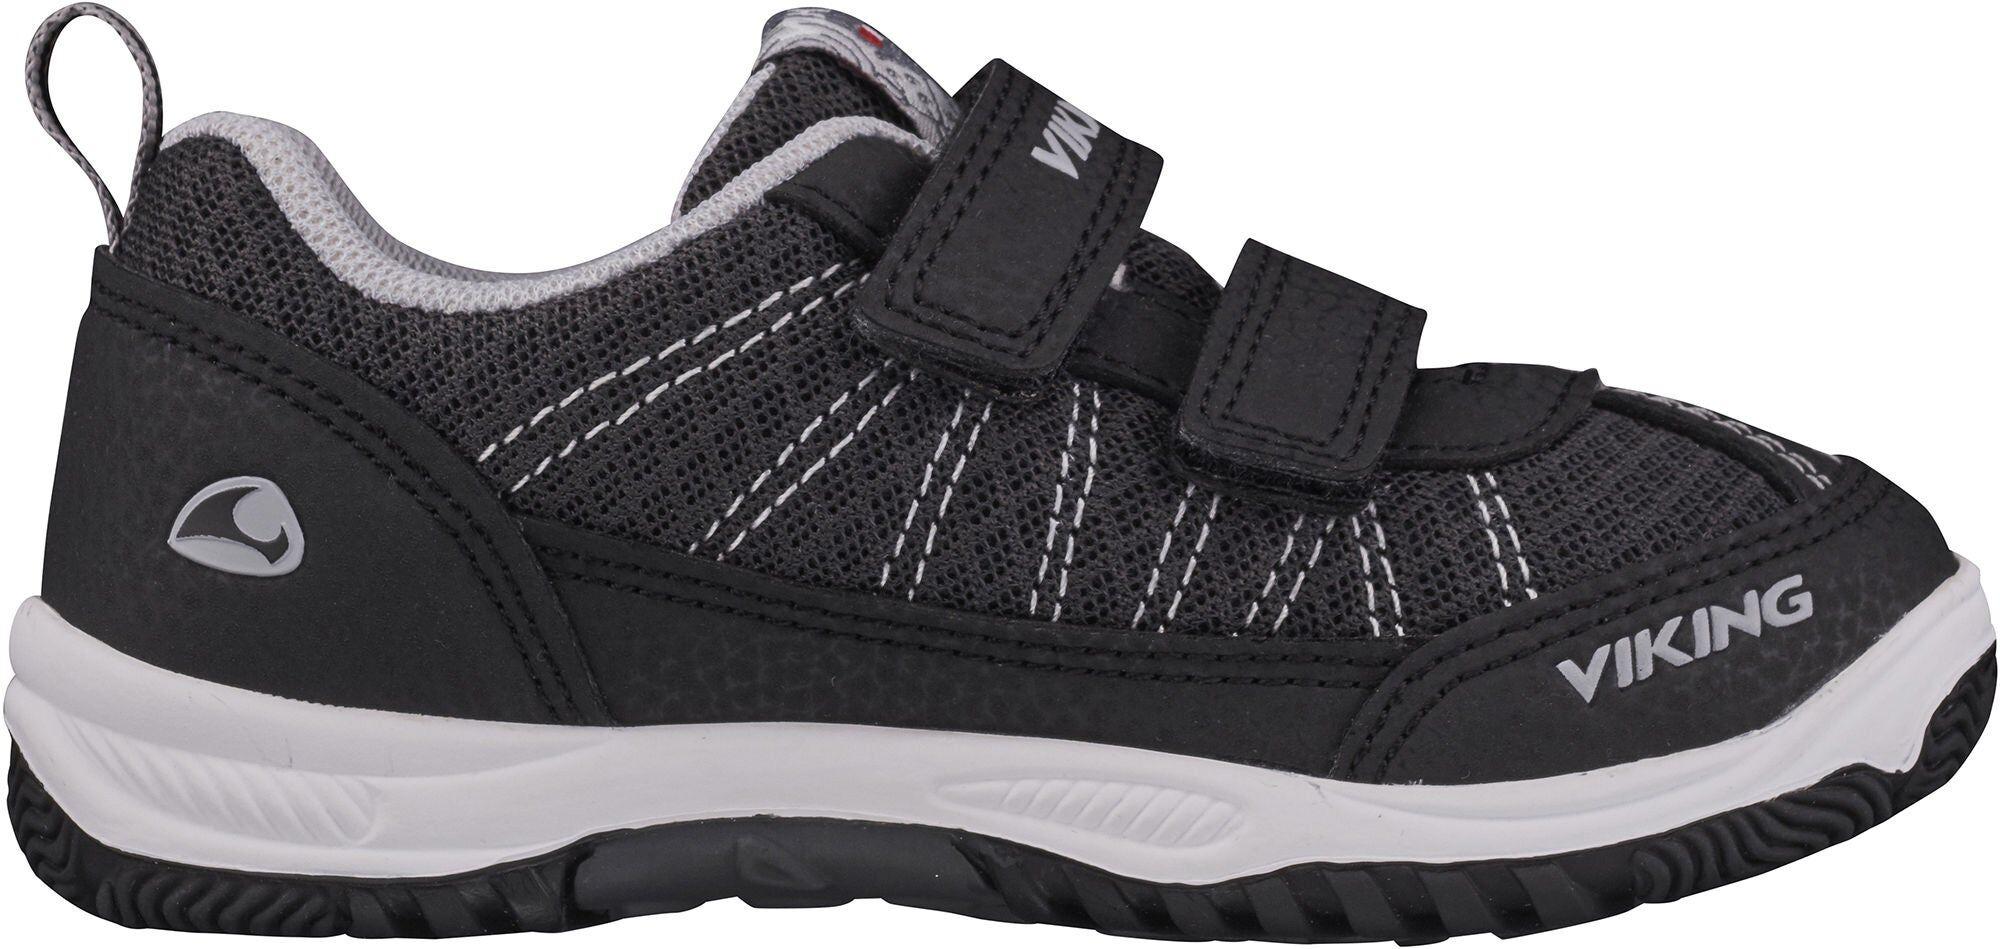 Viking Bryne Sneaker, Black/Grey 33